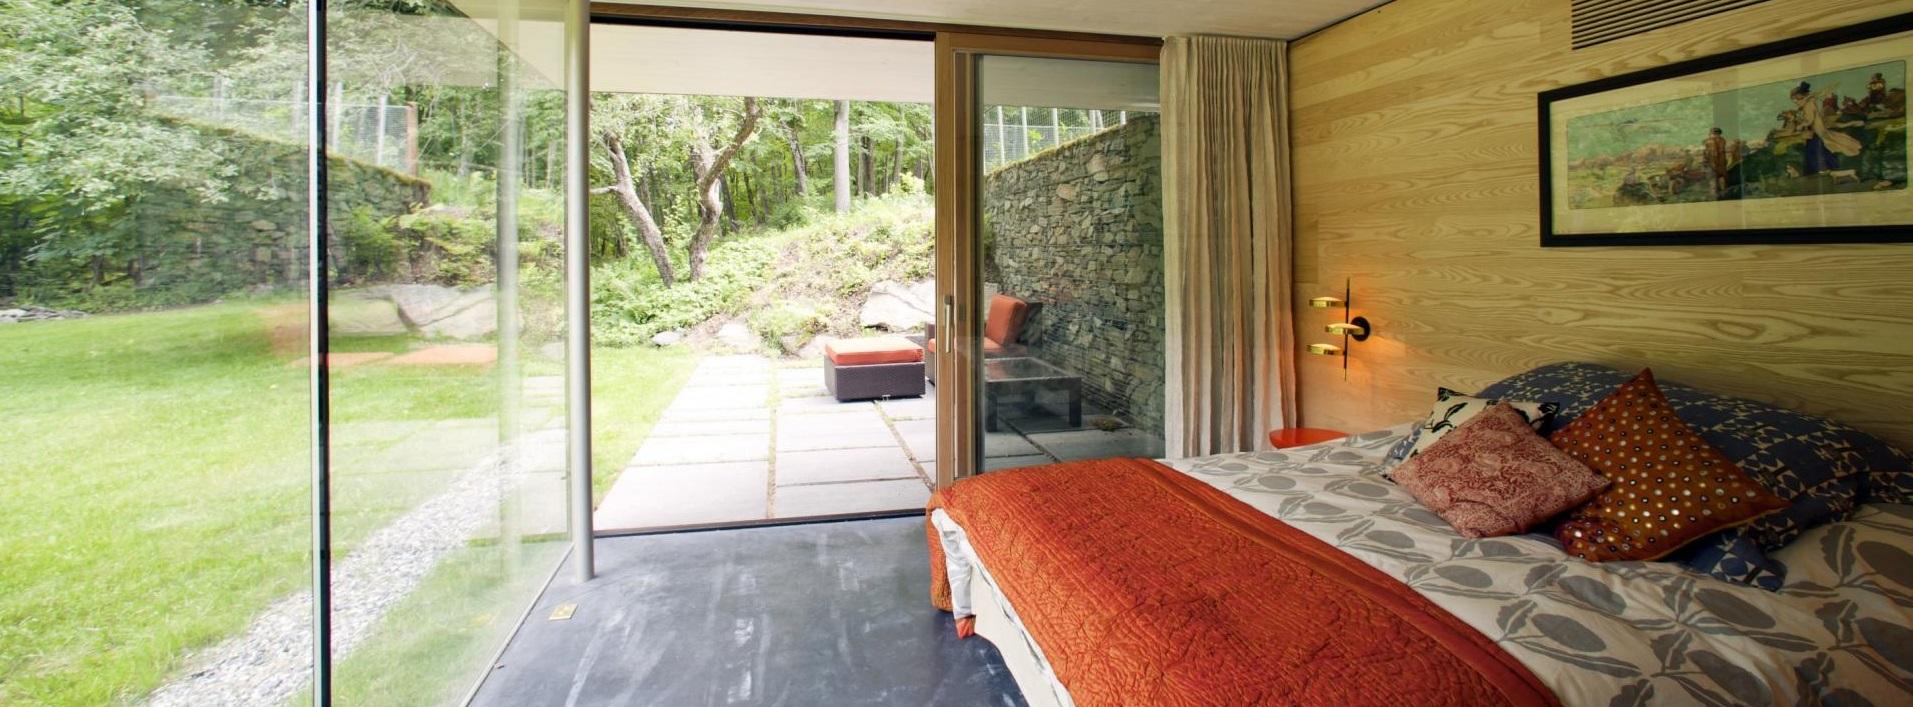 Bedroom-Panoramic-Glass-Wall-Ideas-15